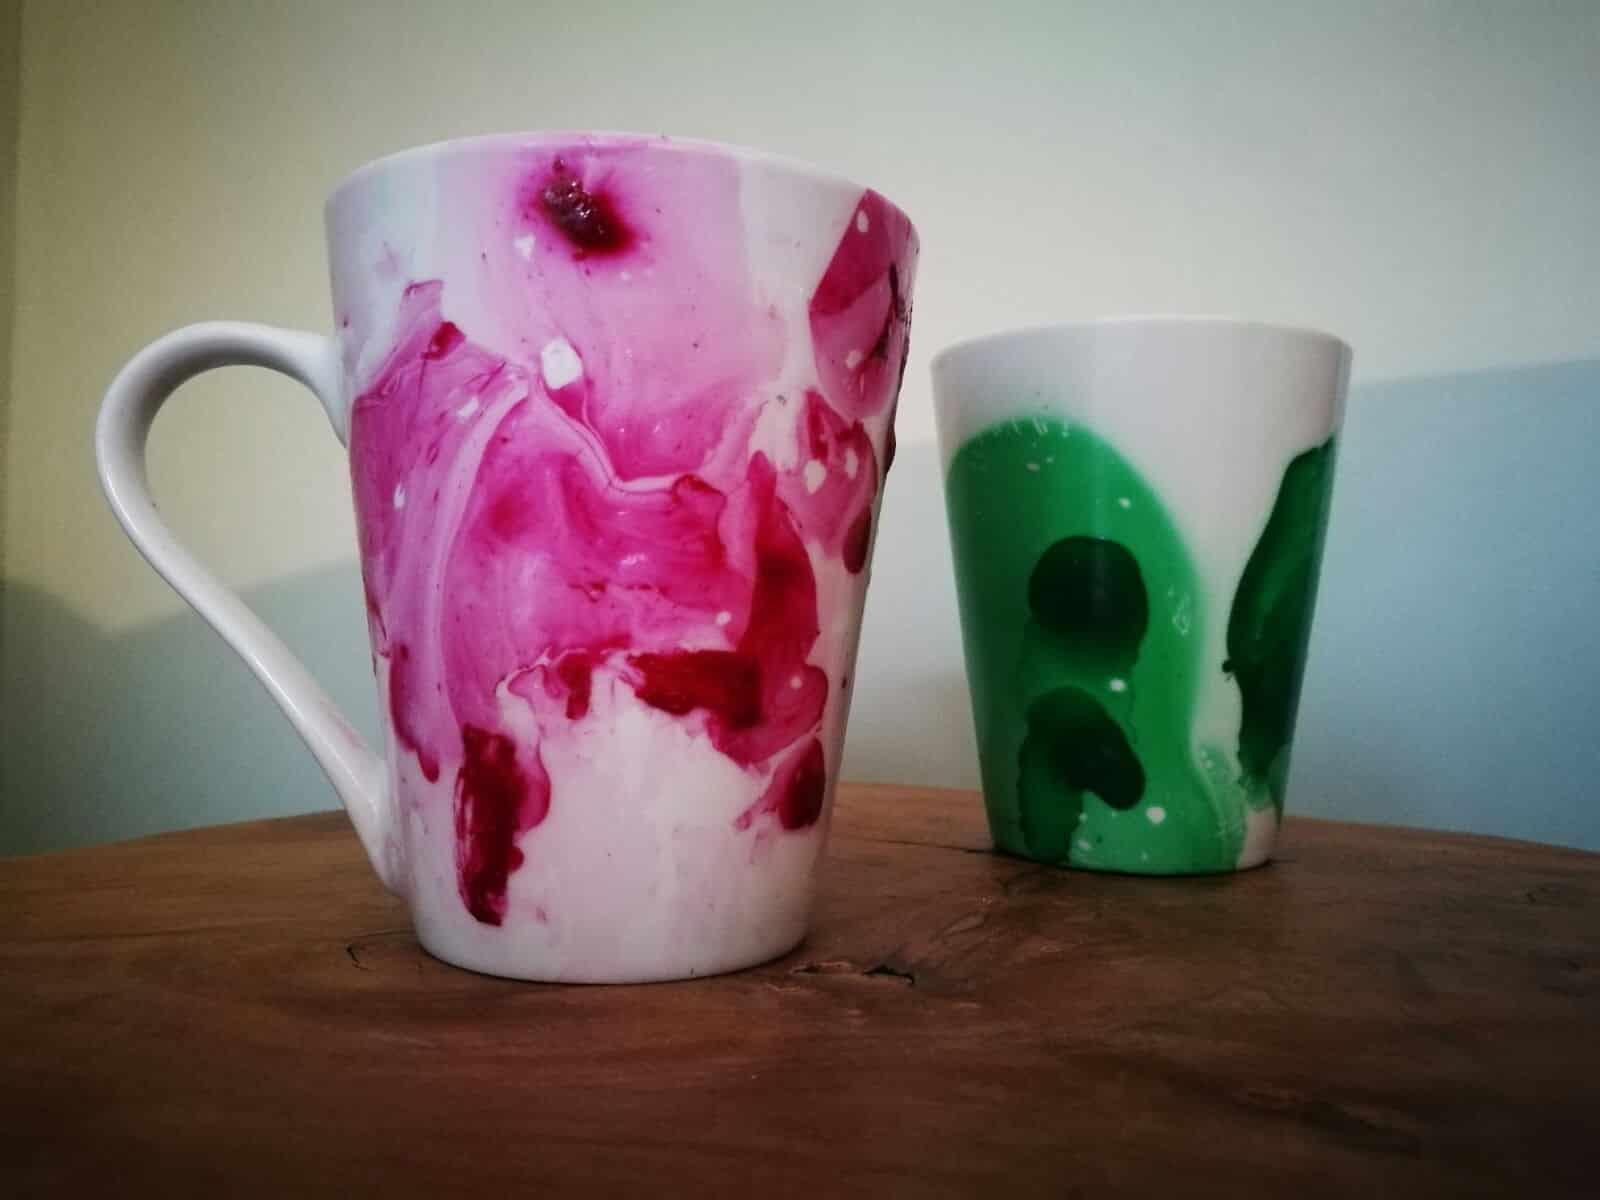 Kaffeetassen mit Farbe gestalten- DIY Idee